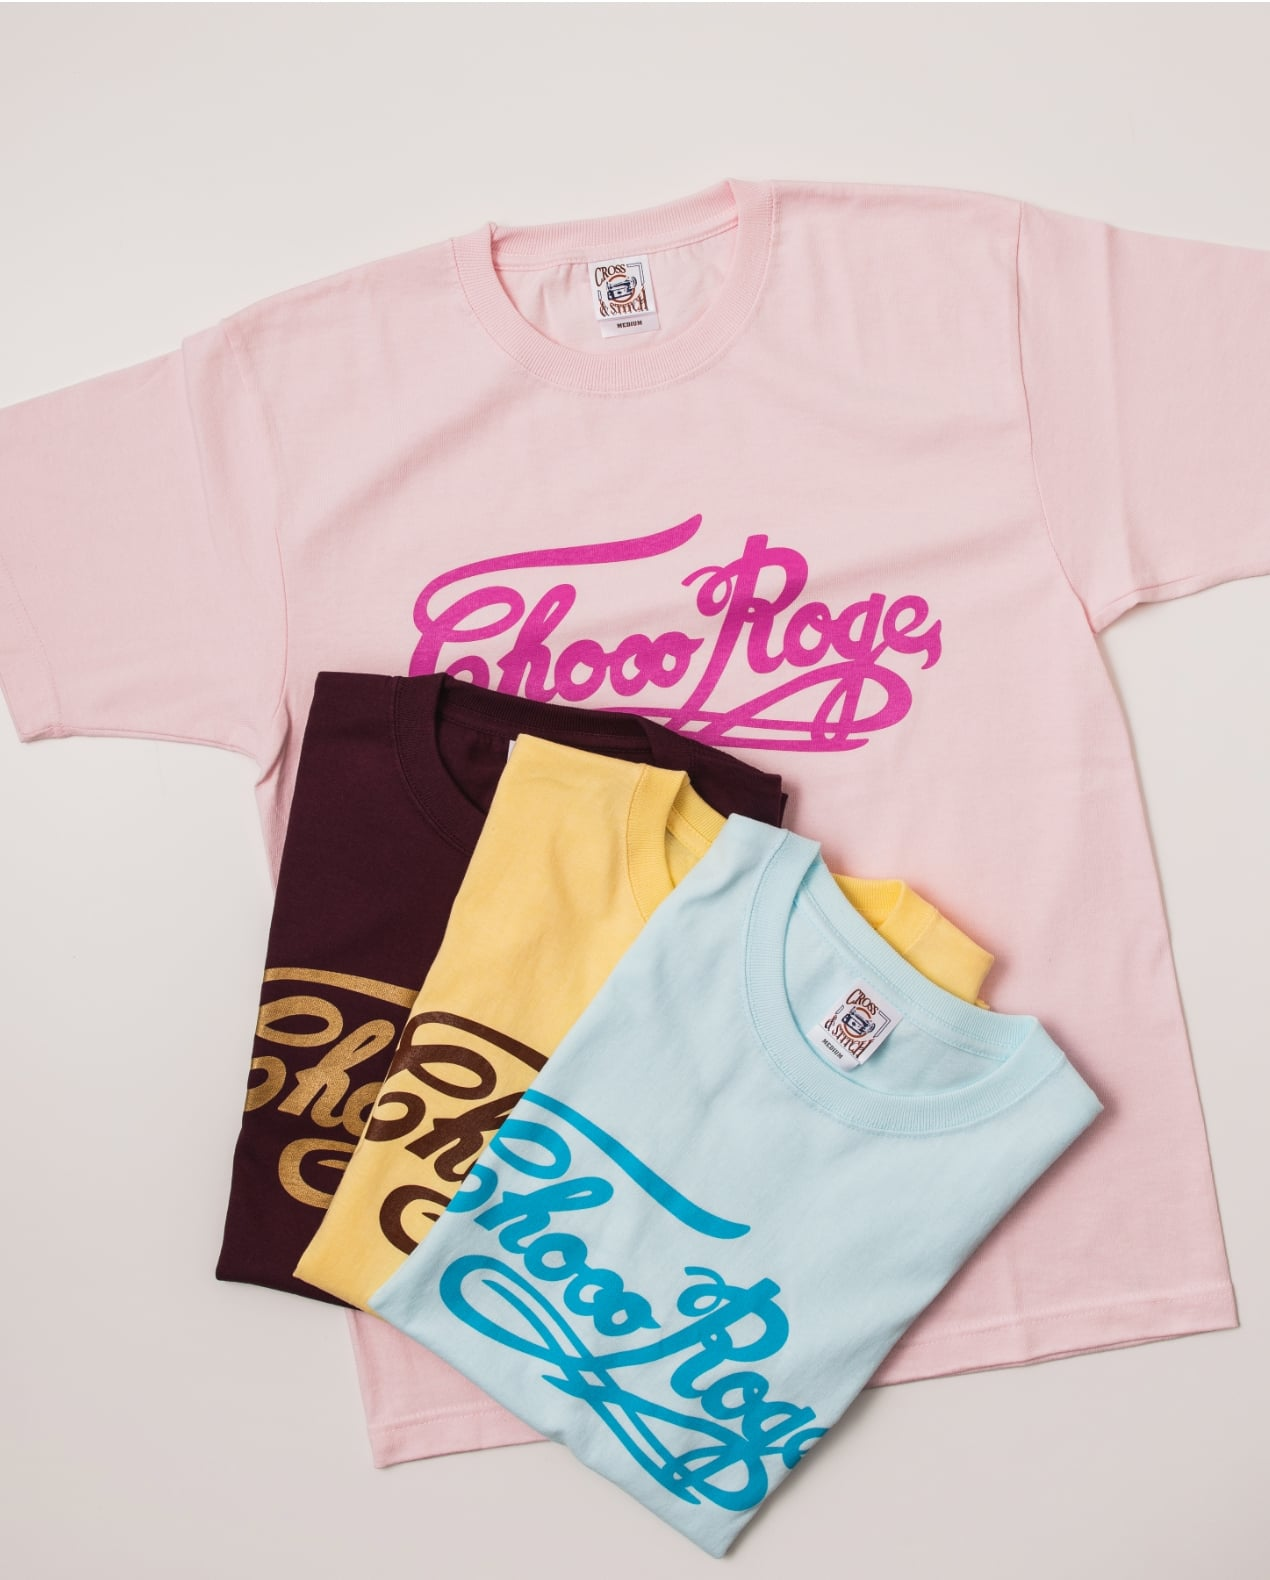 Tシャツ 子供用 茶色 サイズ120